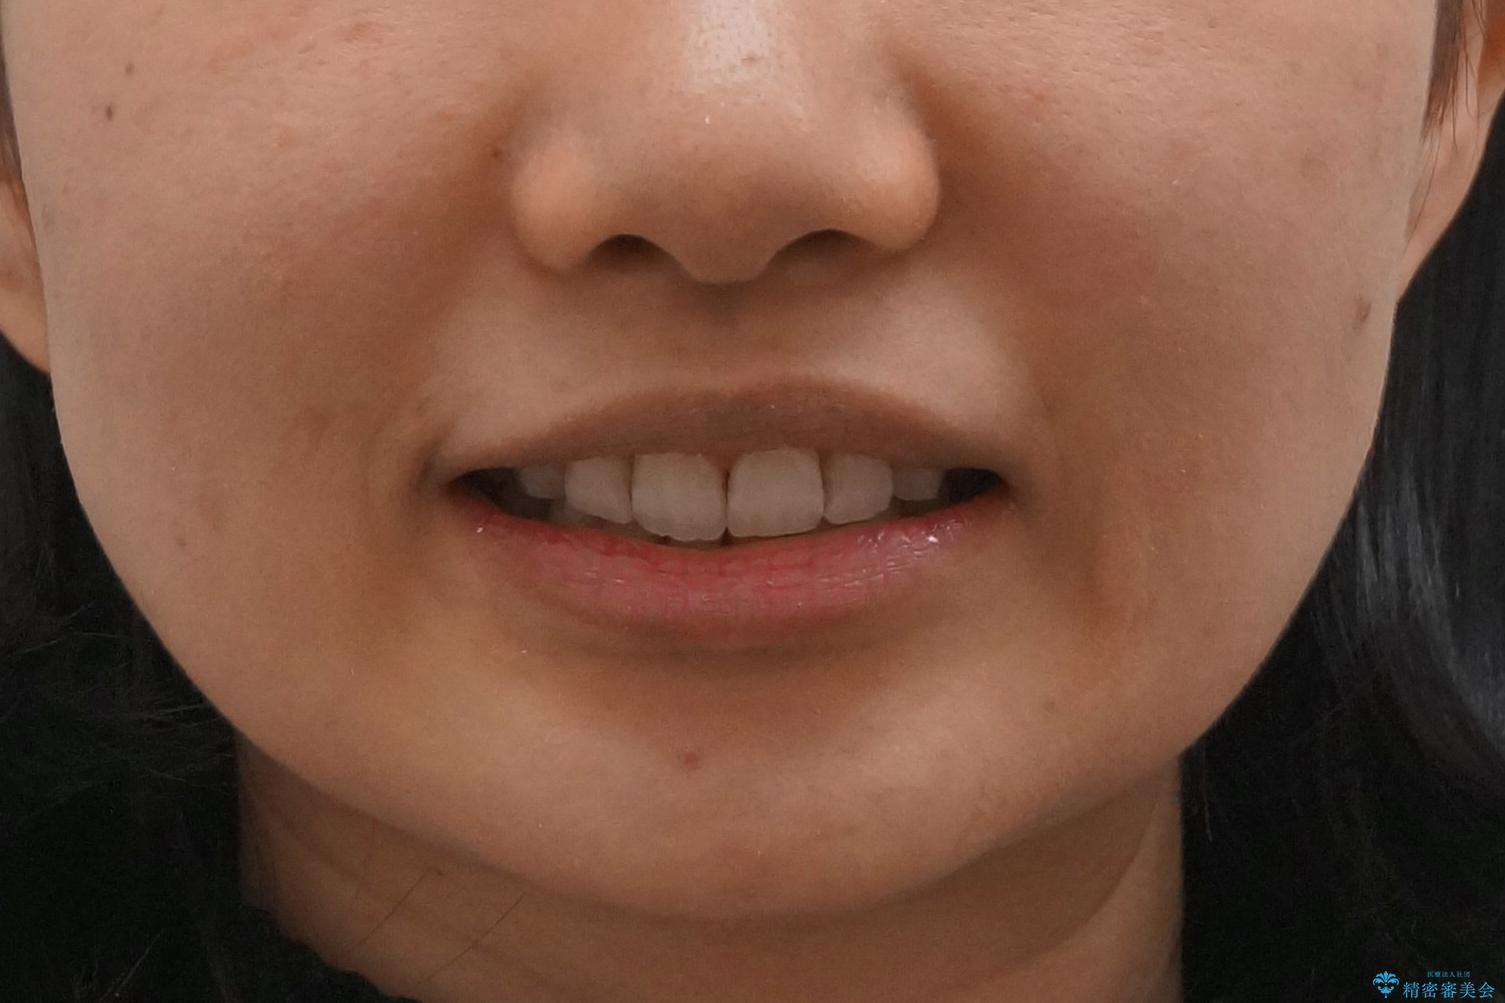 Eラインを整える治療 前歯を引っ込めますの治療後(顔貌)